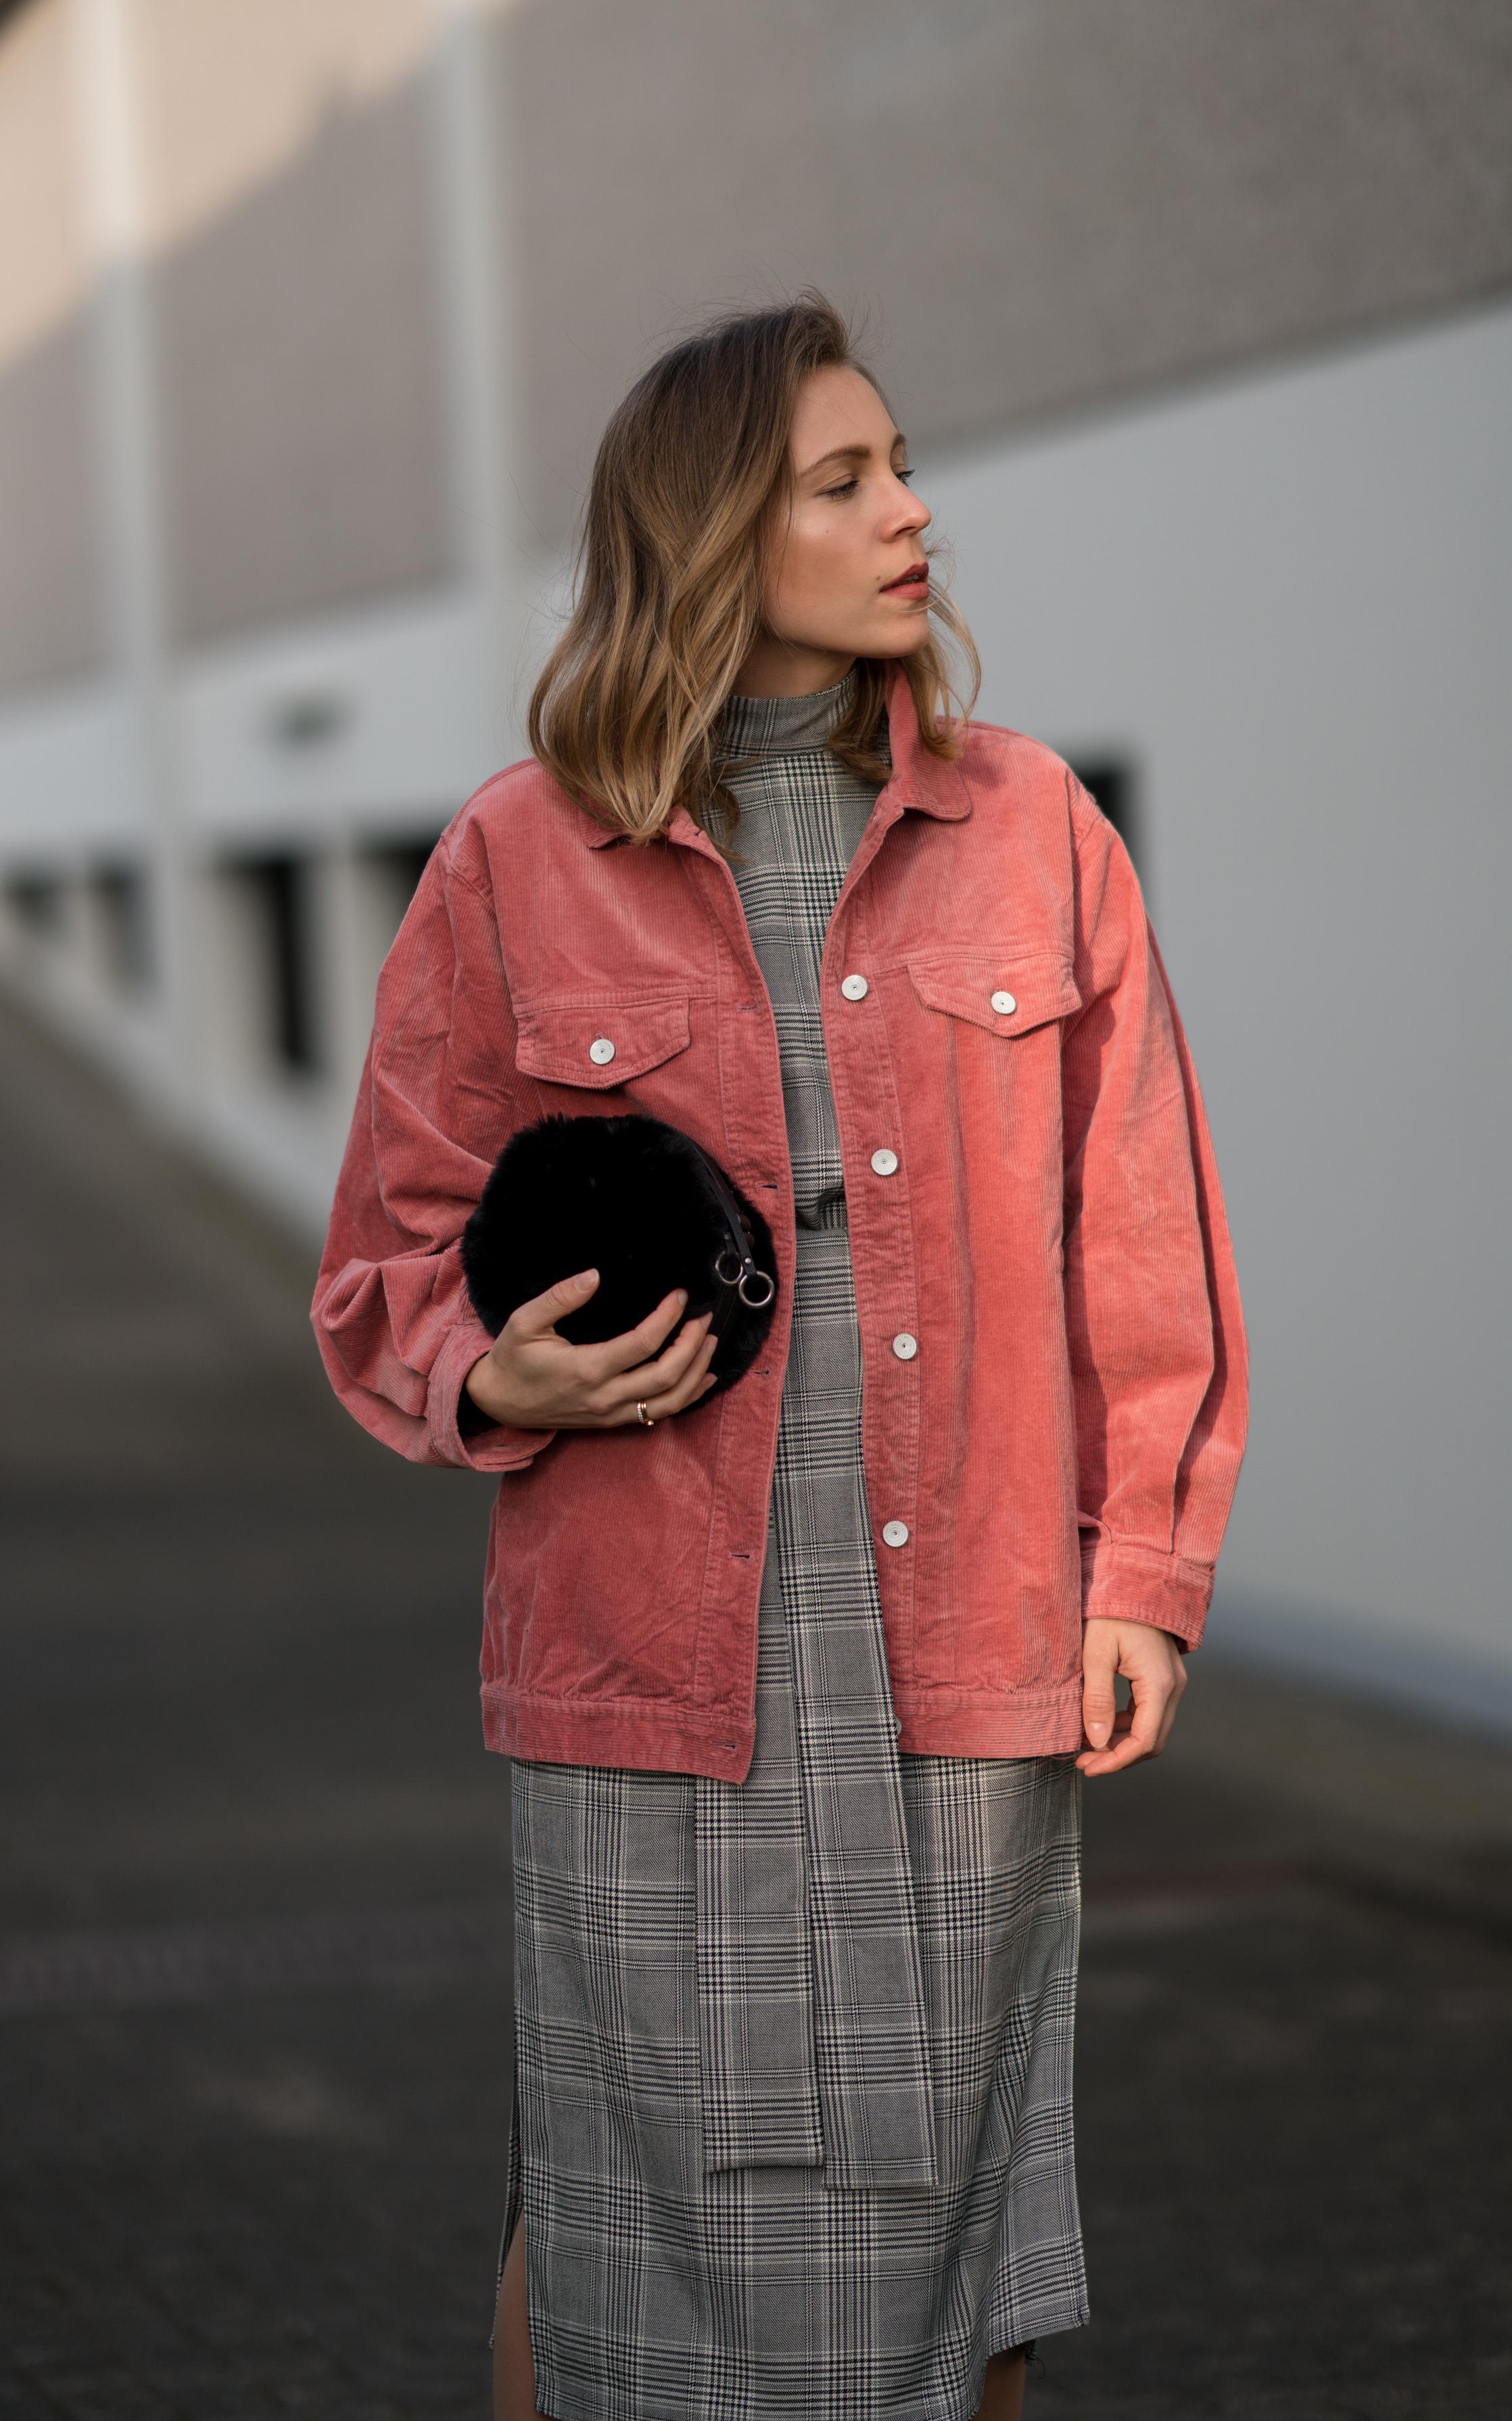 Pink Cord Jacket Glencheck Dress White Sneakers oversize Mango Cordjacke kariertes Kleid Zara Cord Trend Streetstyle Modeblog Sariety Fashionblogger Heidelberg_3-001